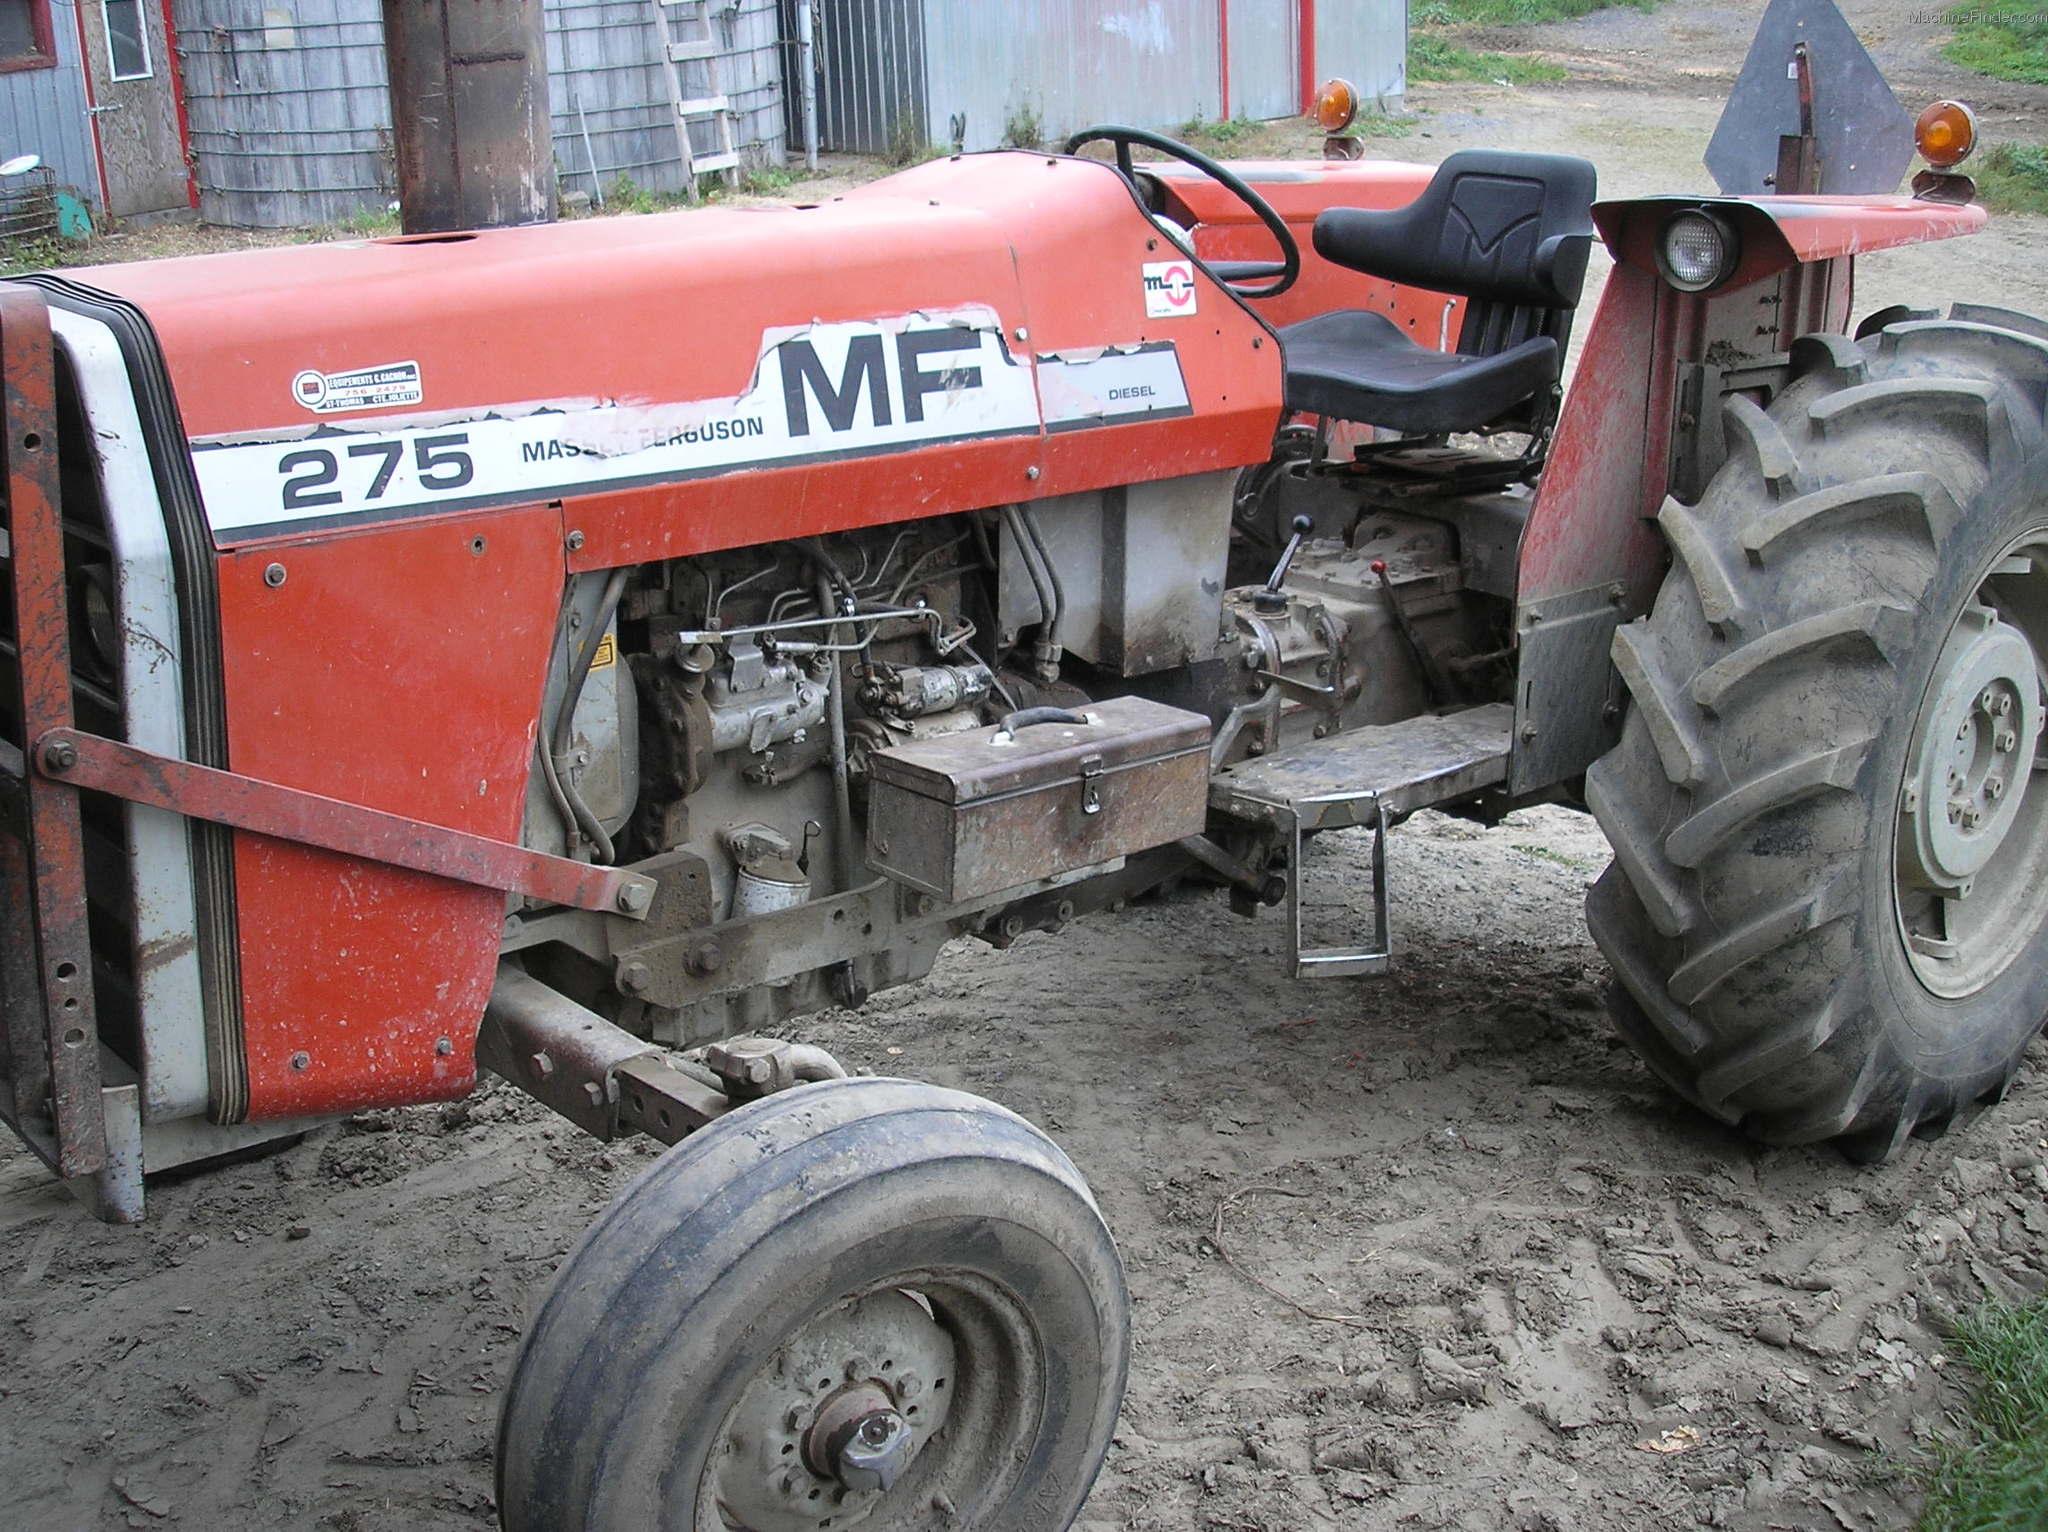 Mf 275 Tractor Data : Tweet